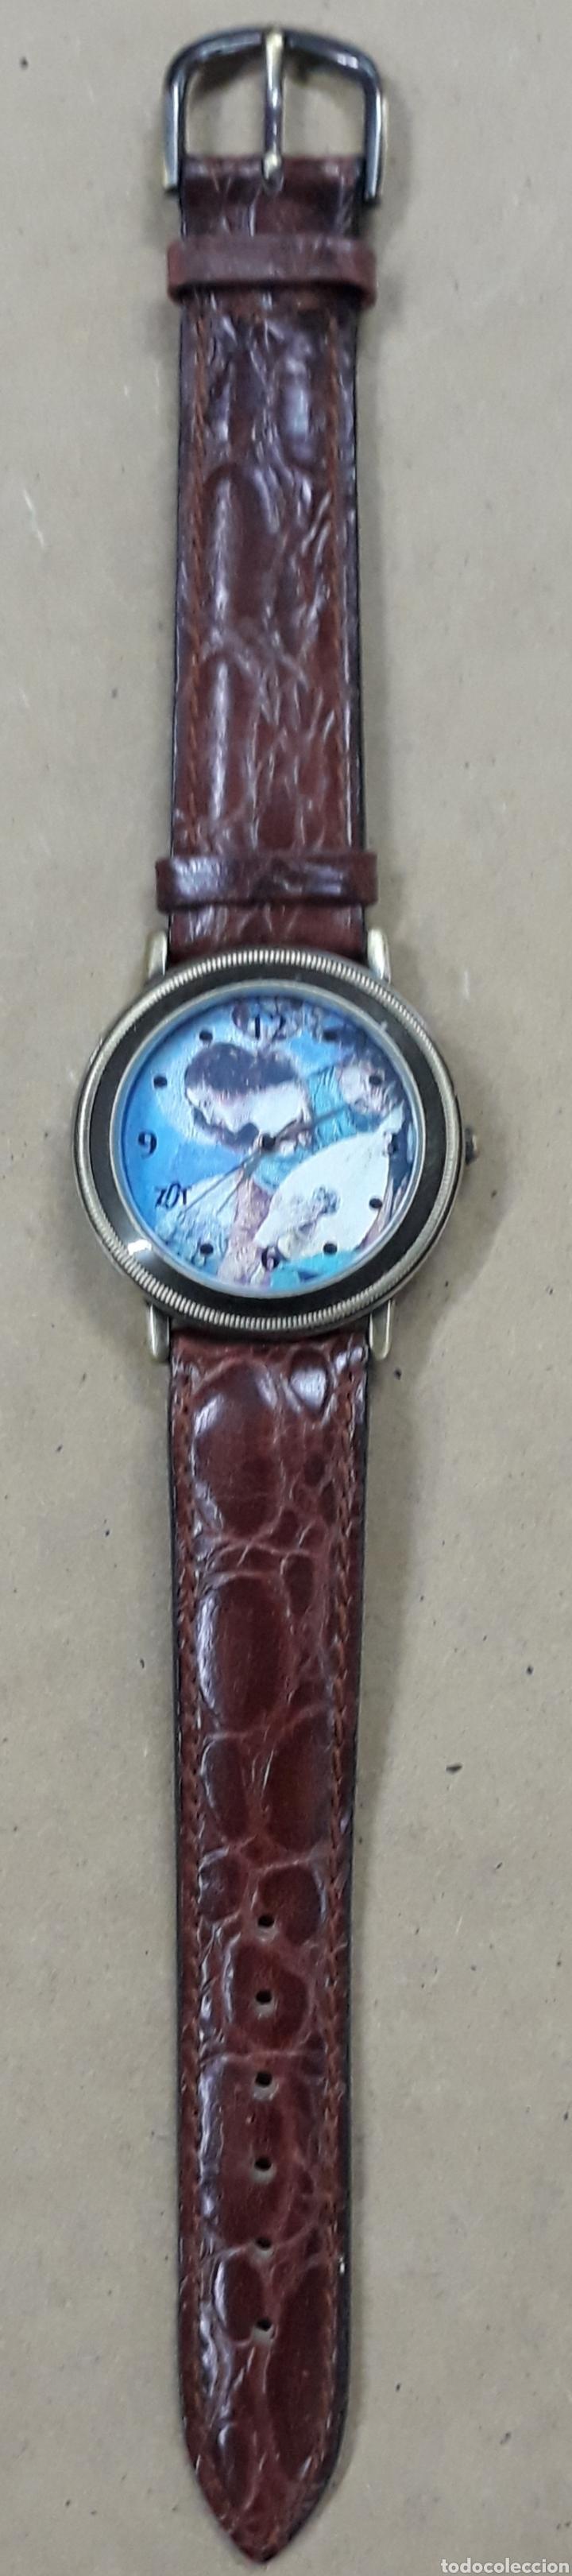 Relojes: Reloj Zot serie limitada coleccion n° 000319 - Foto 3 - 180152336